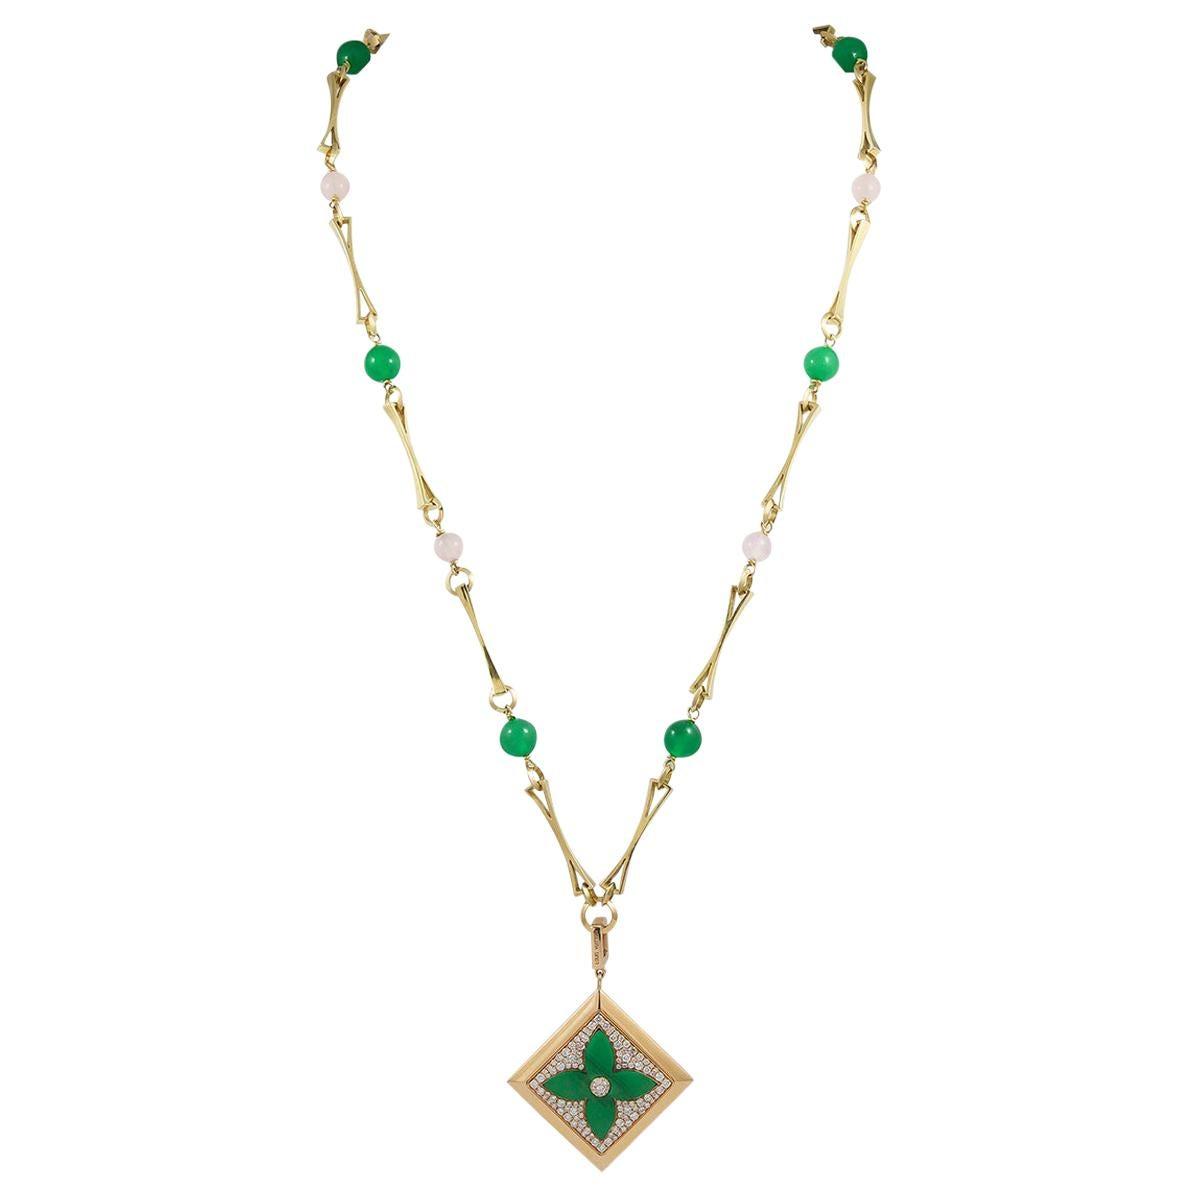 Louis Vuitton Diamond Yellow Gold Monogram Sautoir Detachable Necklace